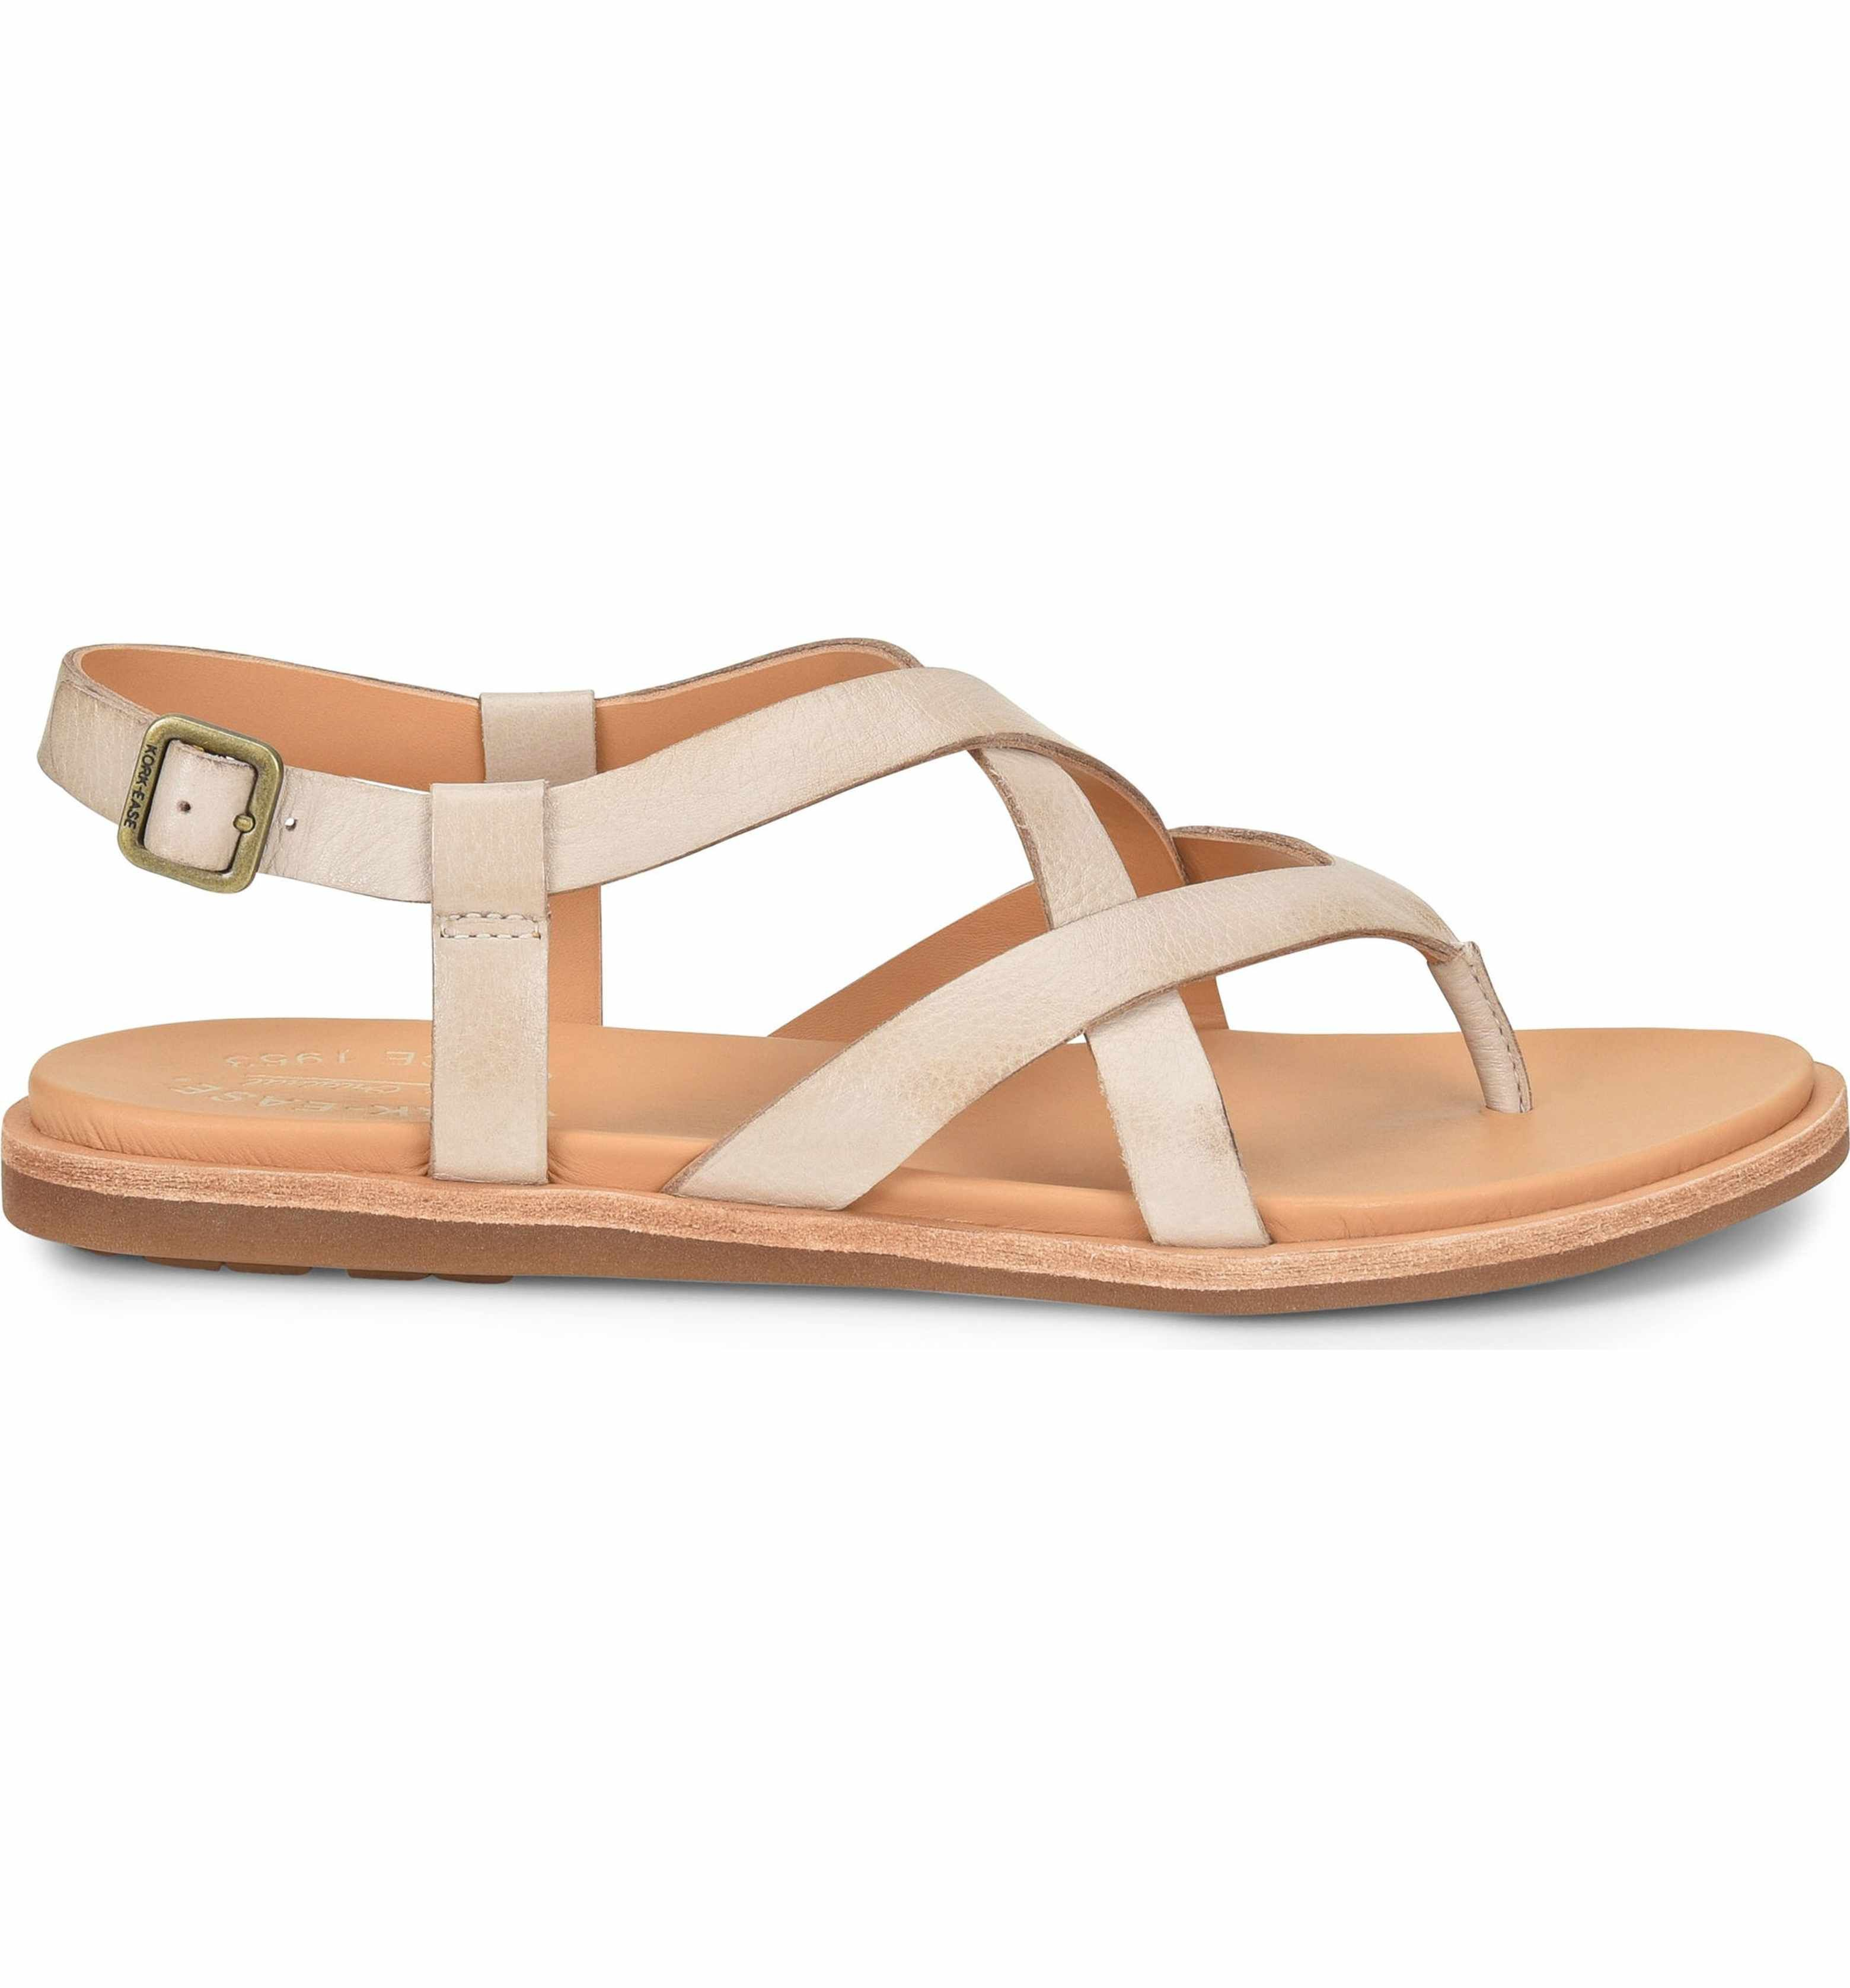 aa240421fdf2 Main Image - Kork-Ease® Yarbrough Sandal (Women)